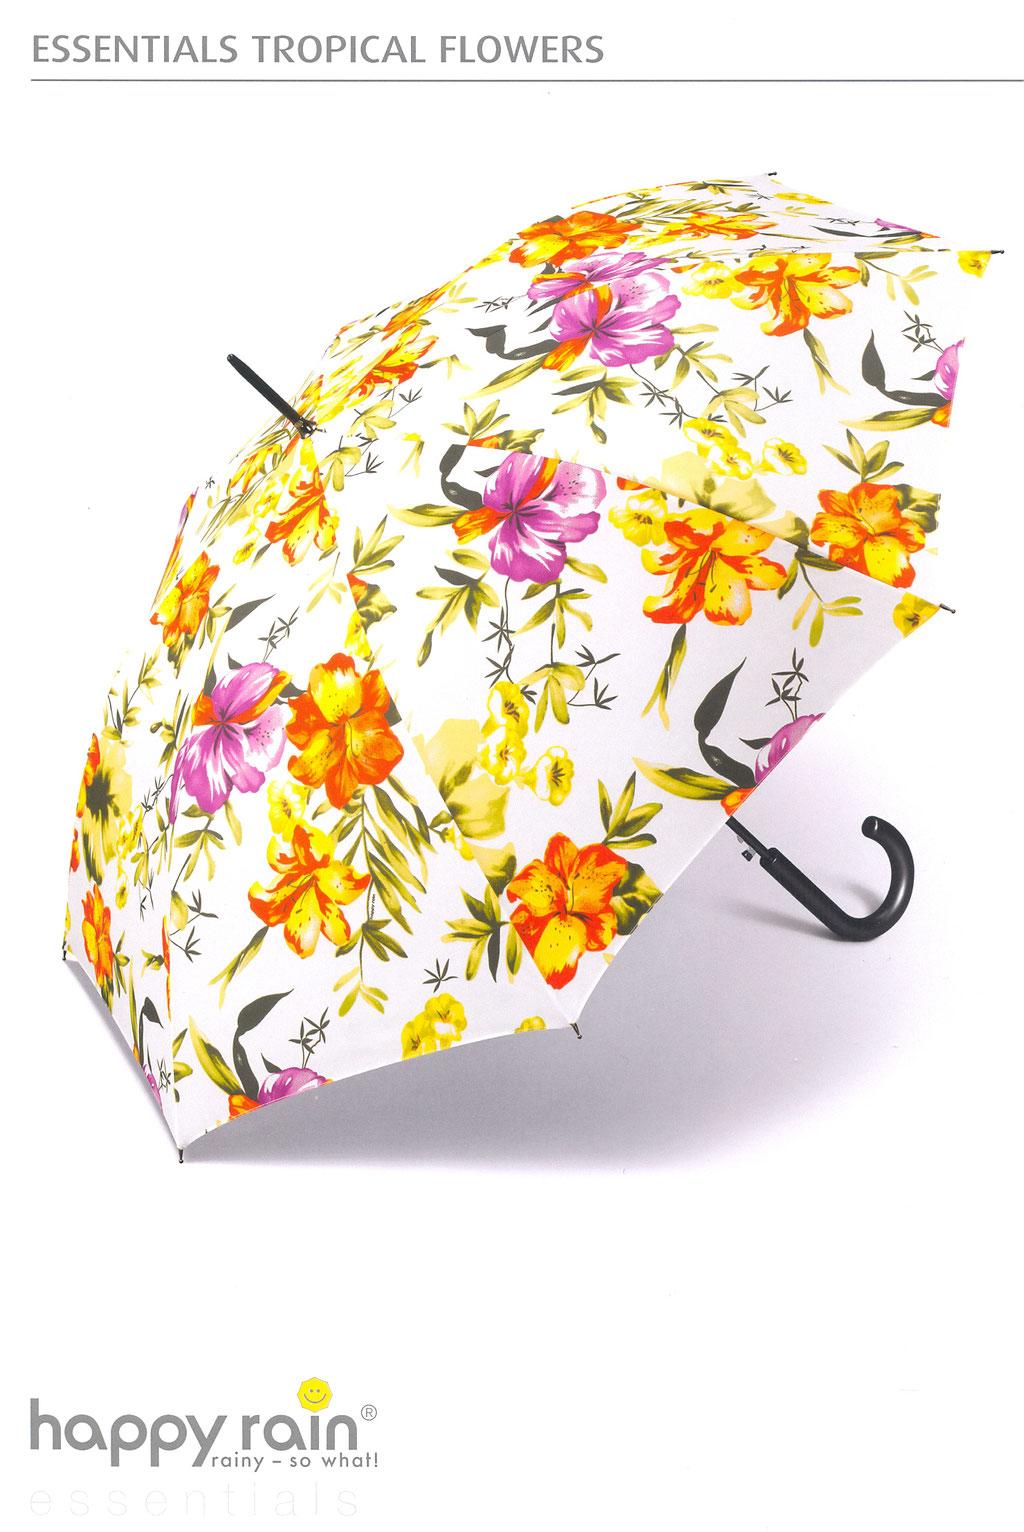 Essentials Tropical Flowers